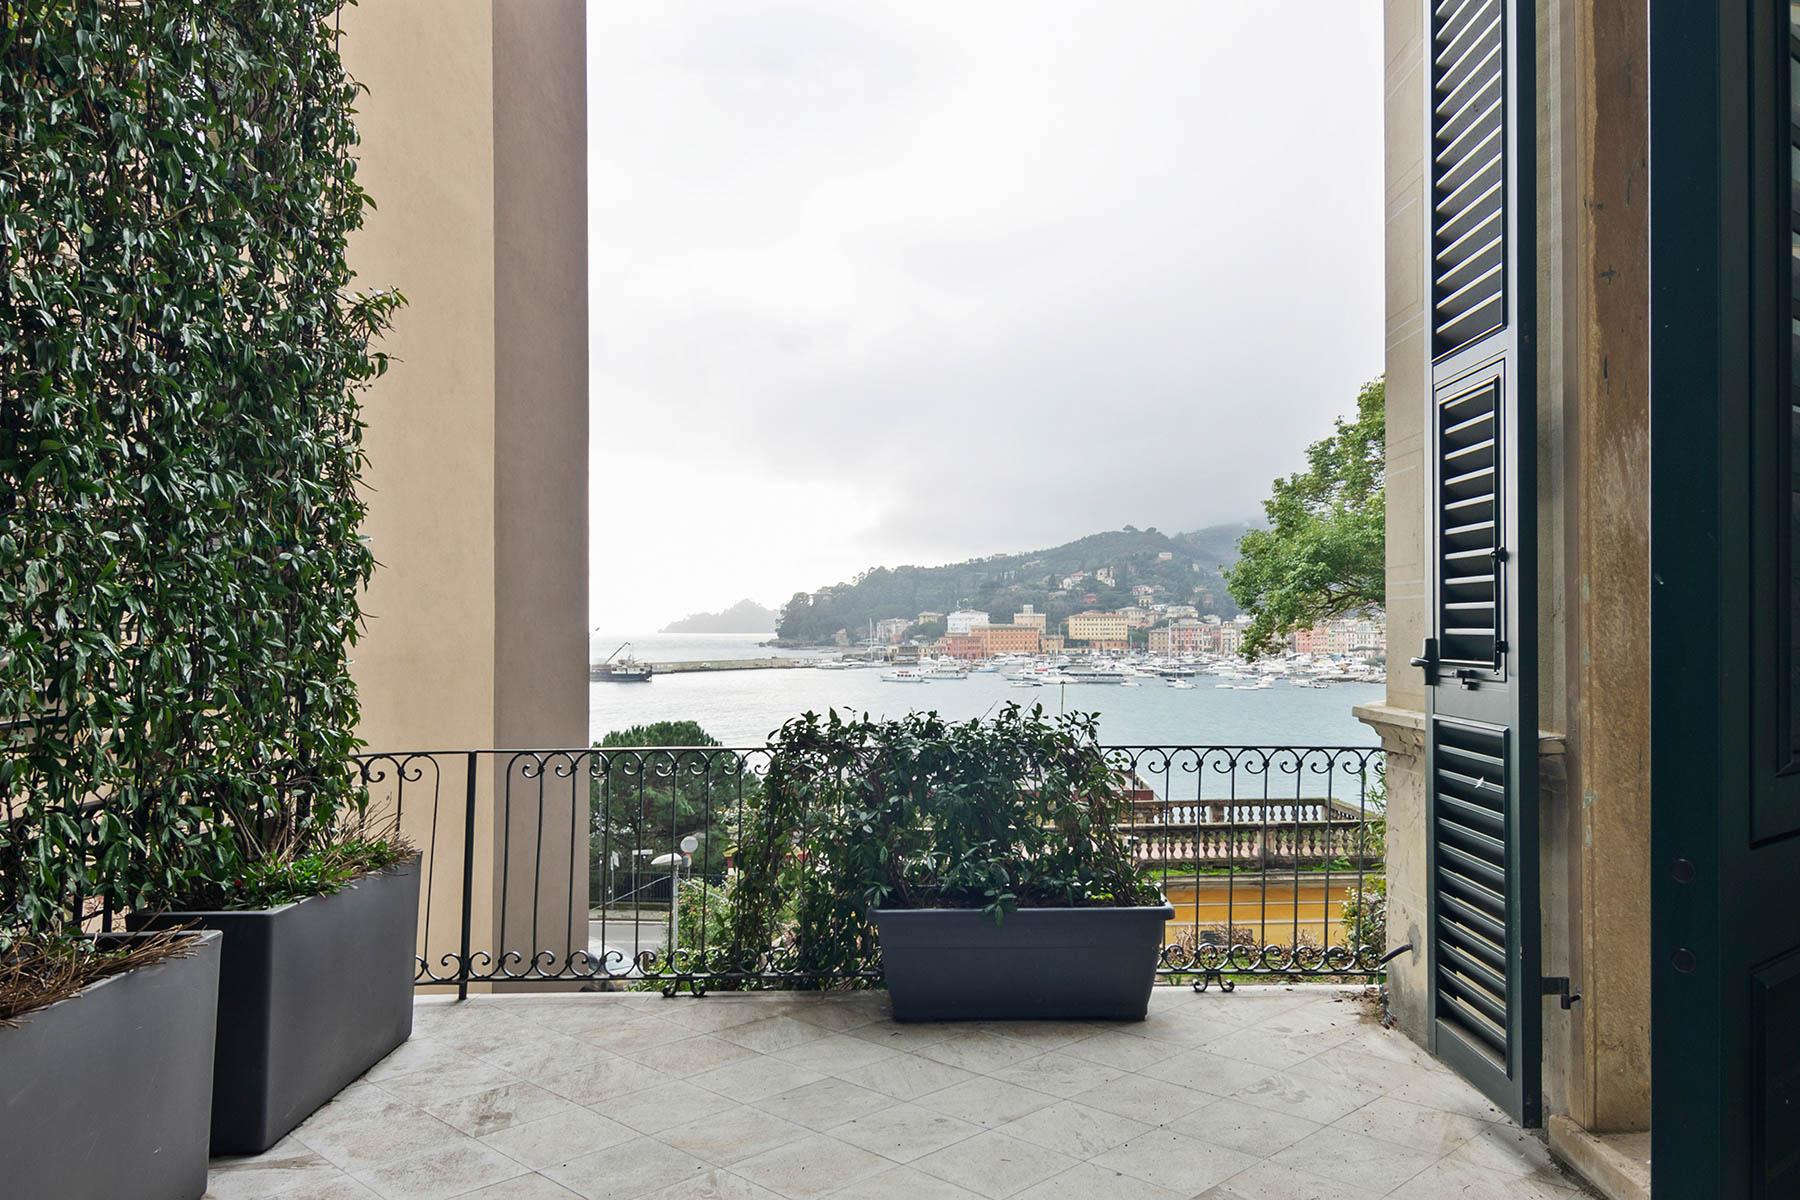 Appartamento in Vendita a Santa Margherita Ligure via roma